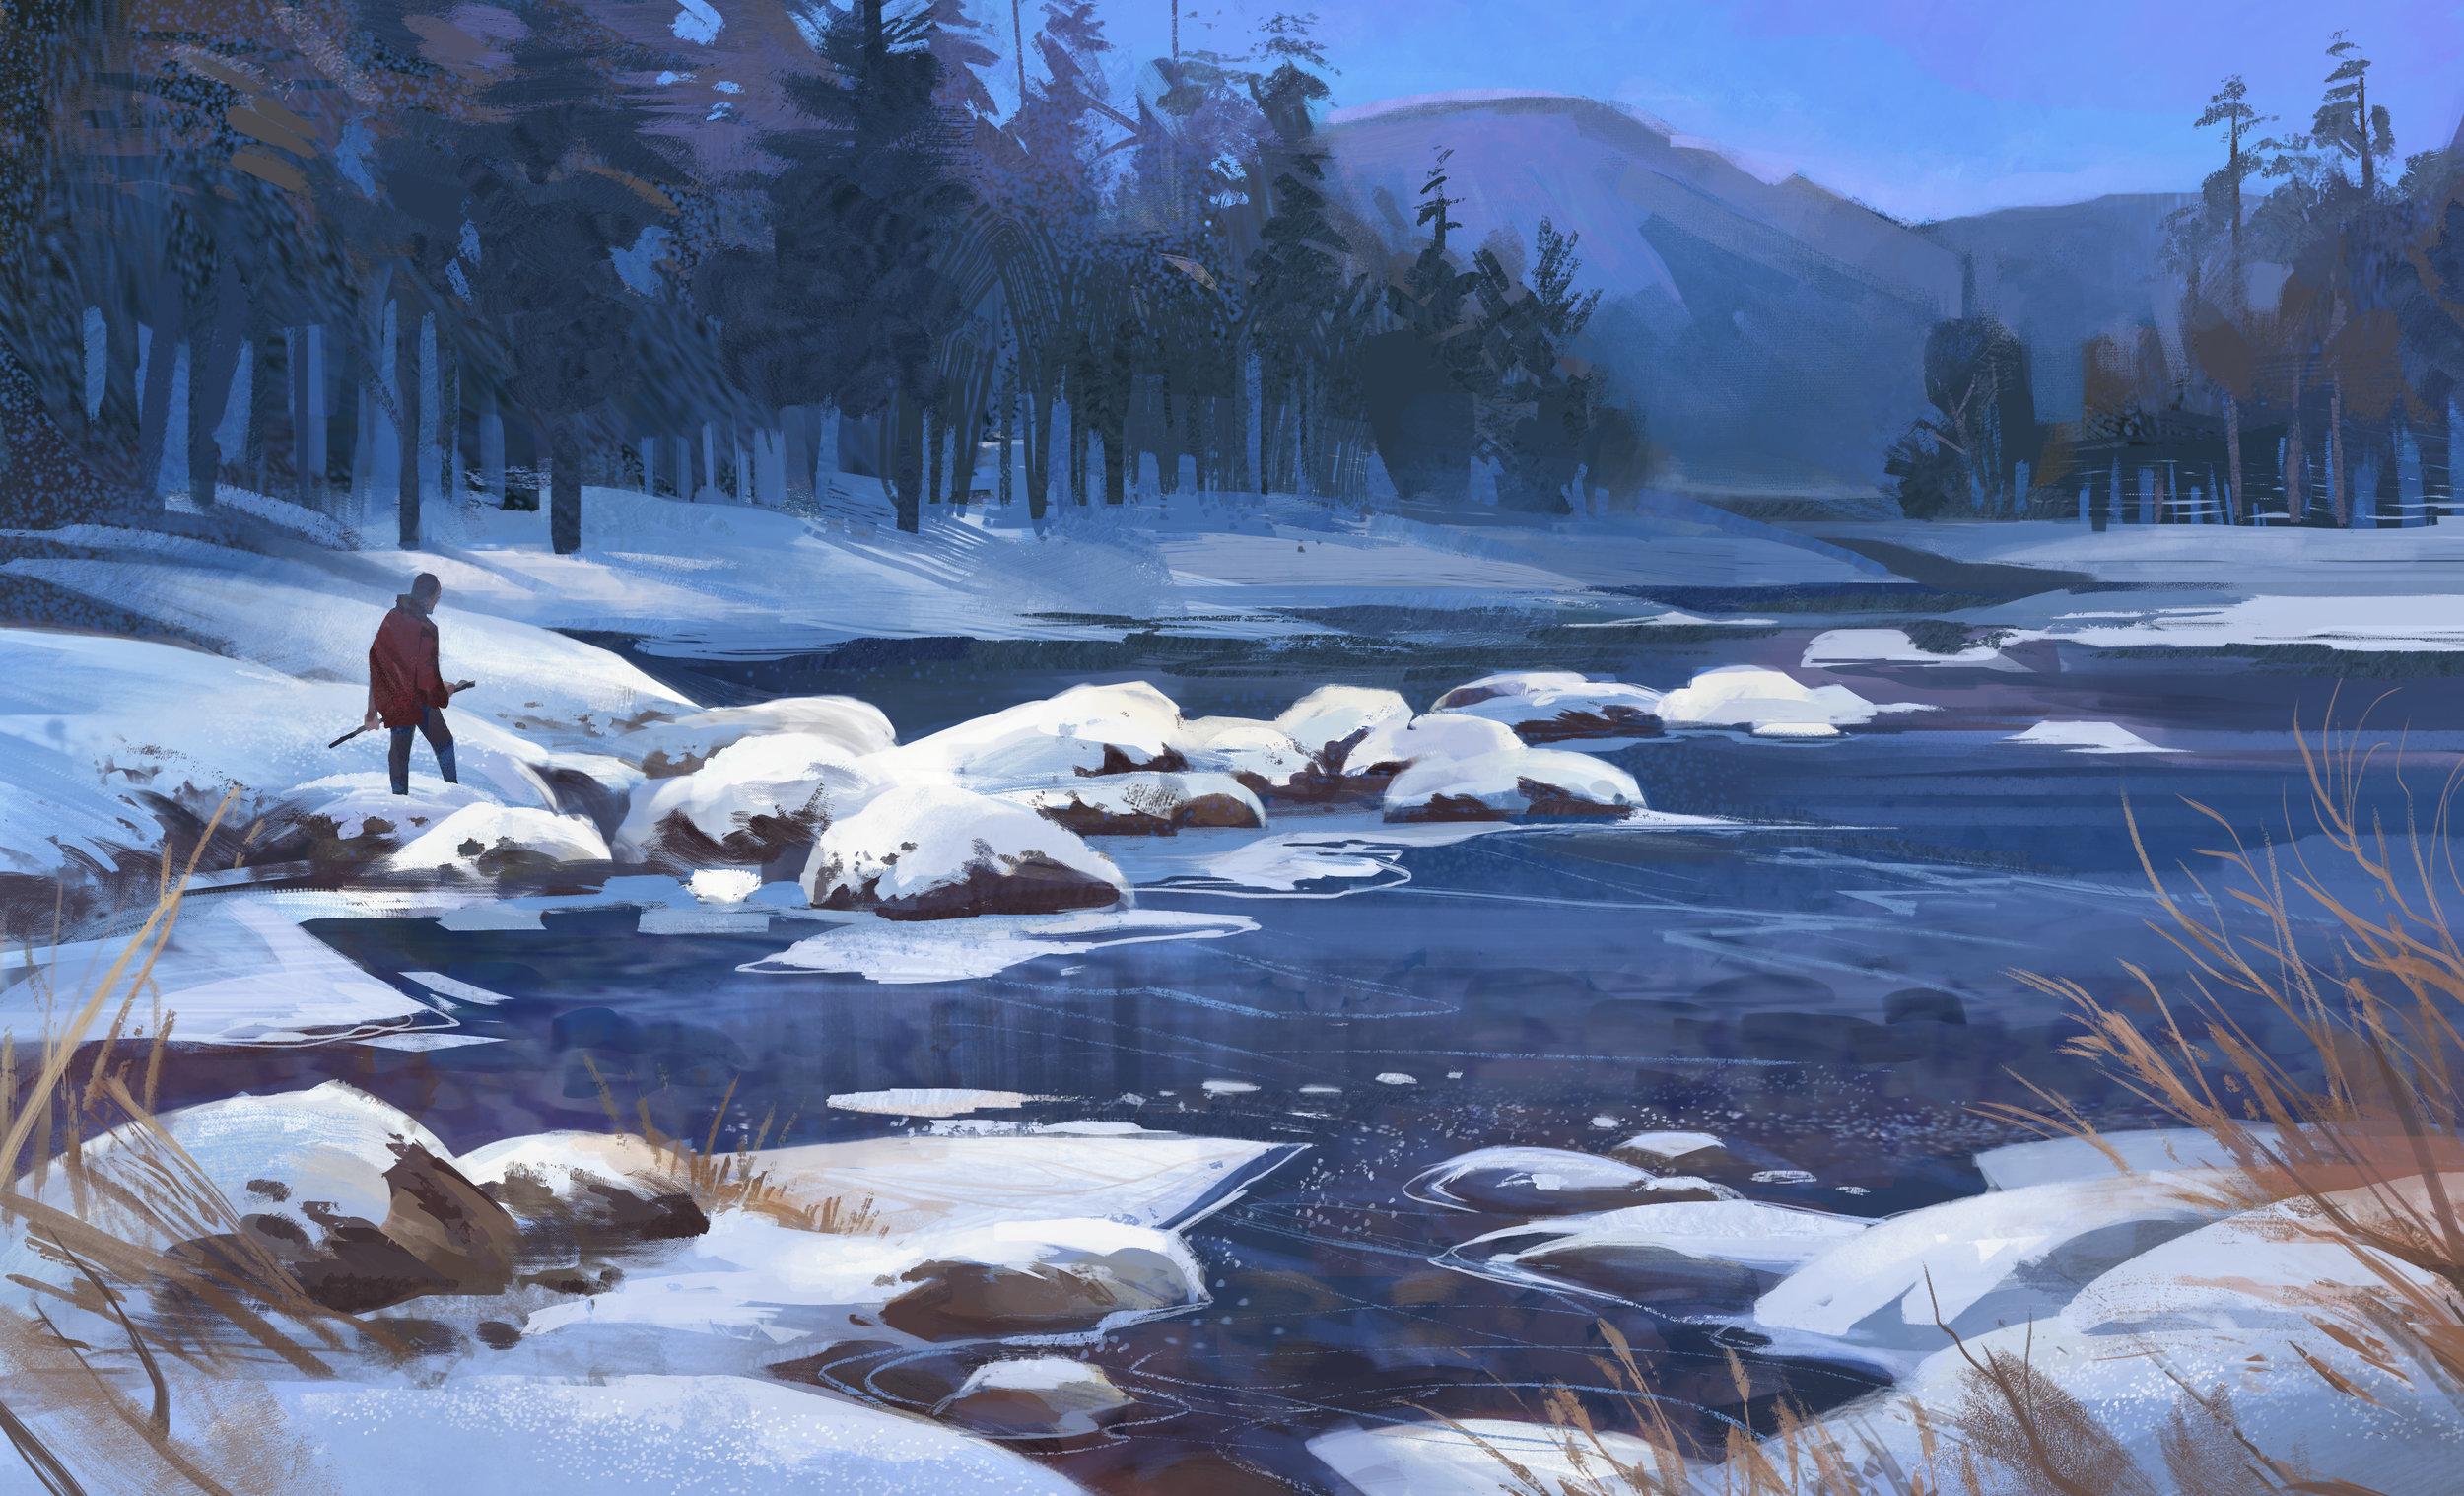 12-23-16_snowbanks.jpg